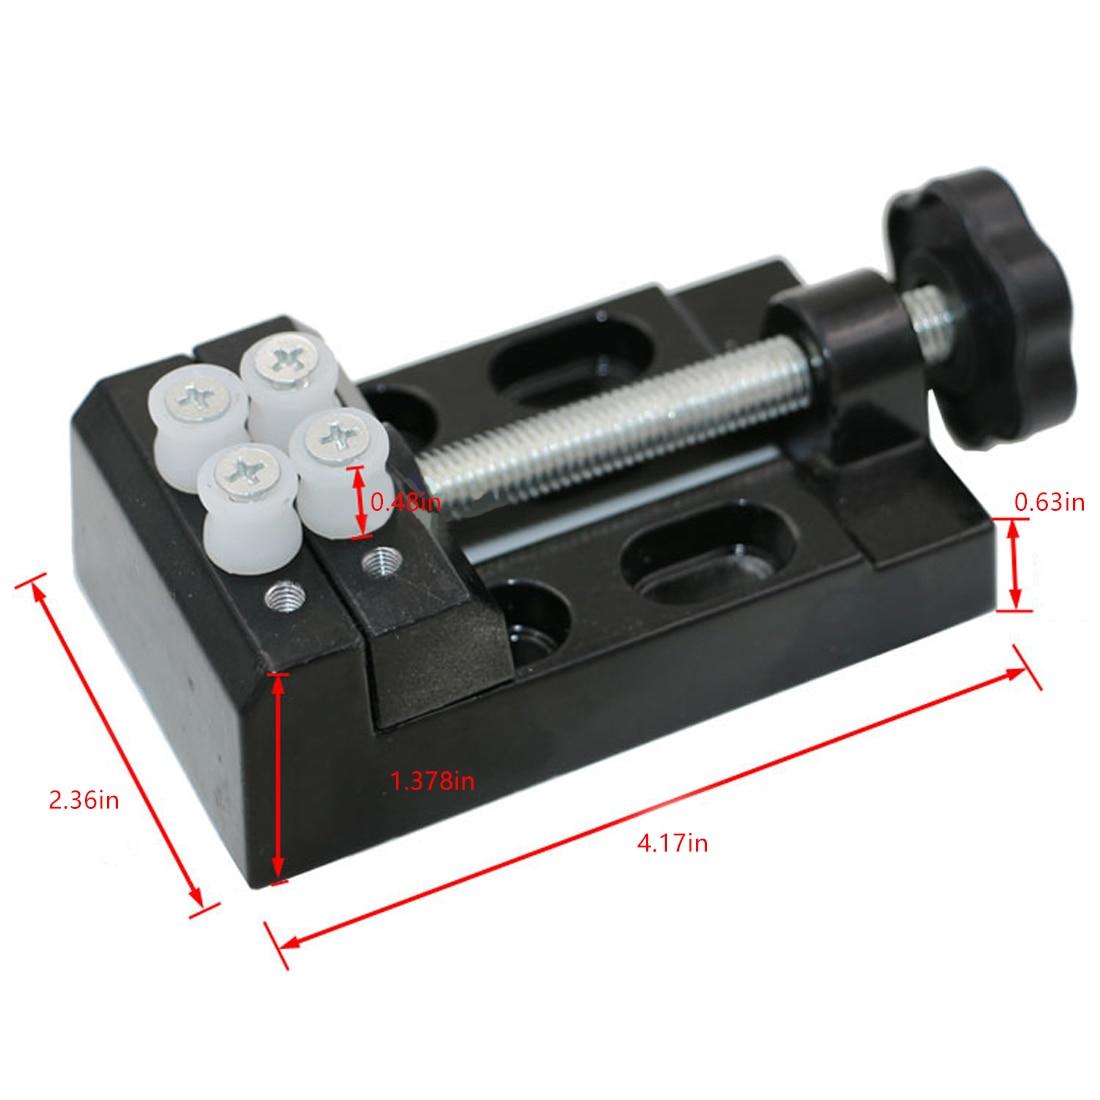 Black Jaw Bench Clamp Mini Drill Press Vice Micro Clip Flat Vise DIY Hand Tools 105 x 55 x 35mm